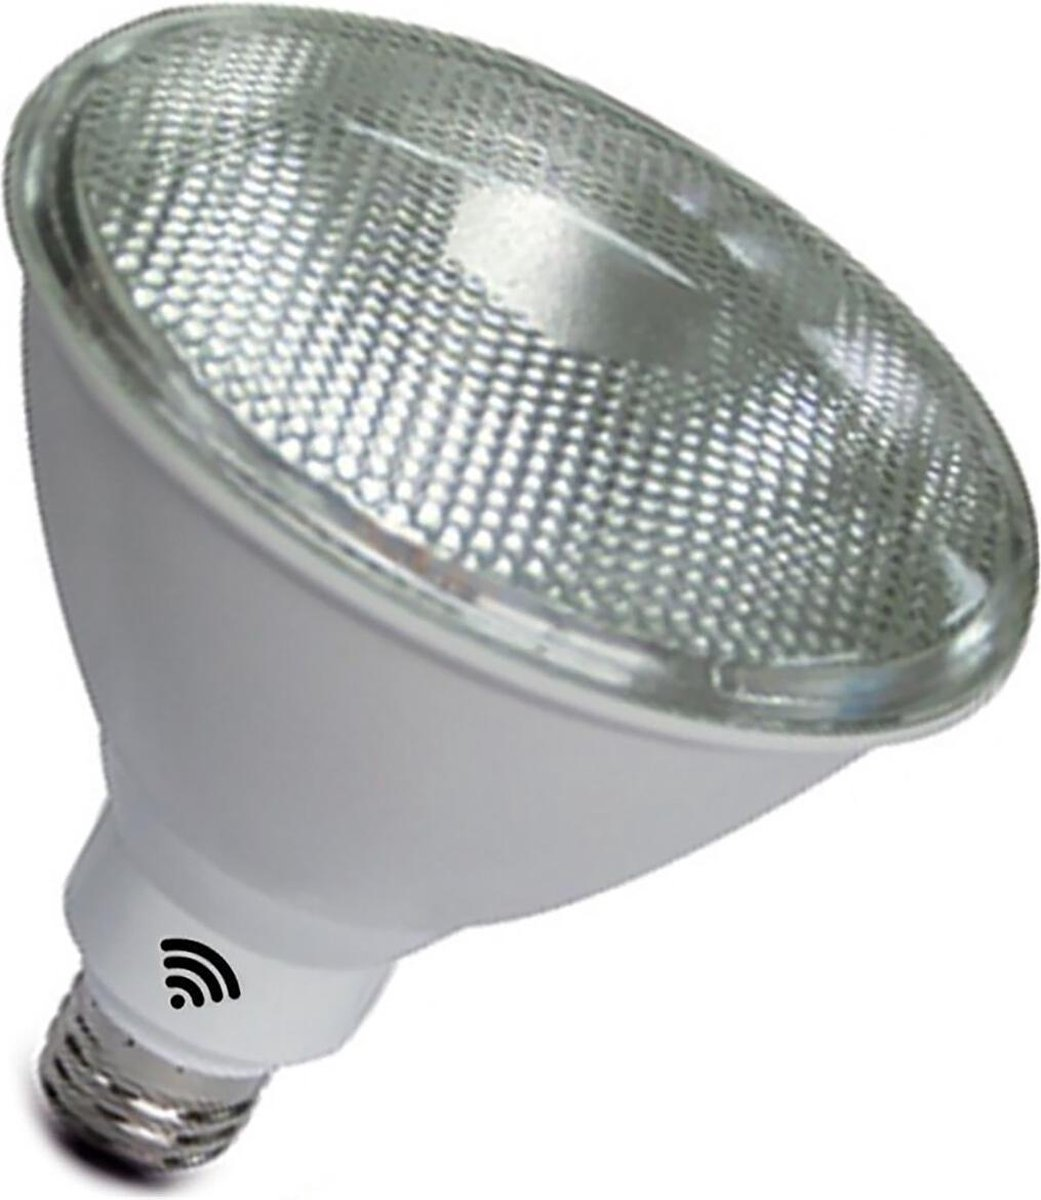 LED Lamp - Smart LED - Facto Sponty - PAR Lamp - 12W - E27 Fitting - Slimme LED - Wifi LED - Dimbaar - Aanpasbare Kleur - RGB+CCT - Waterdicht - BSE